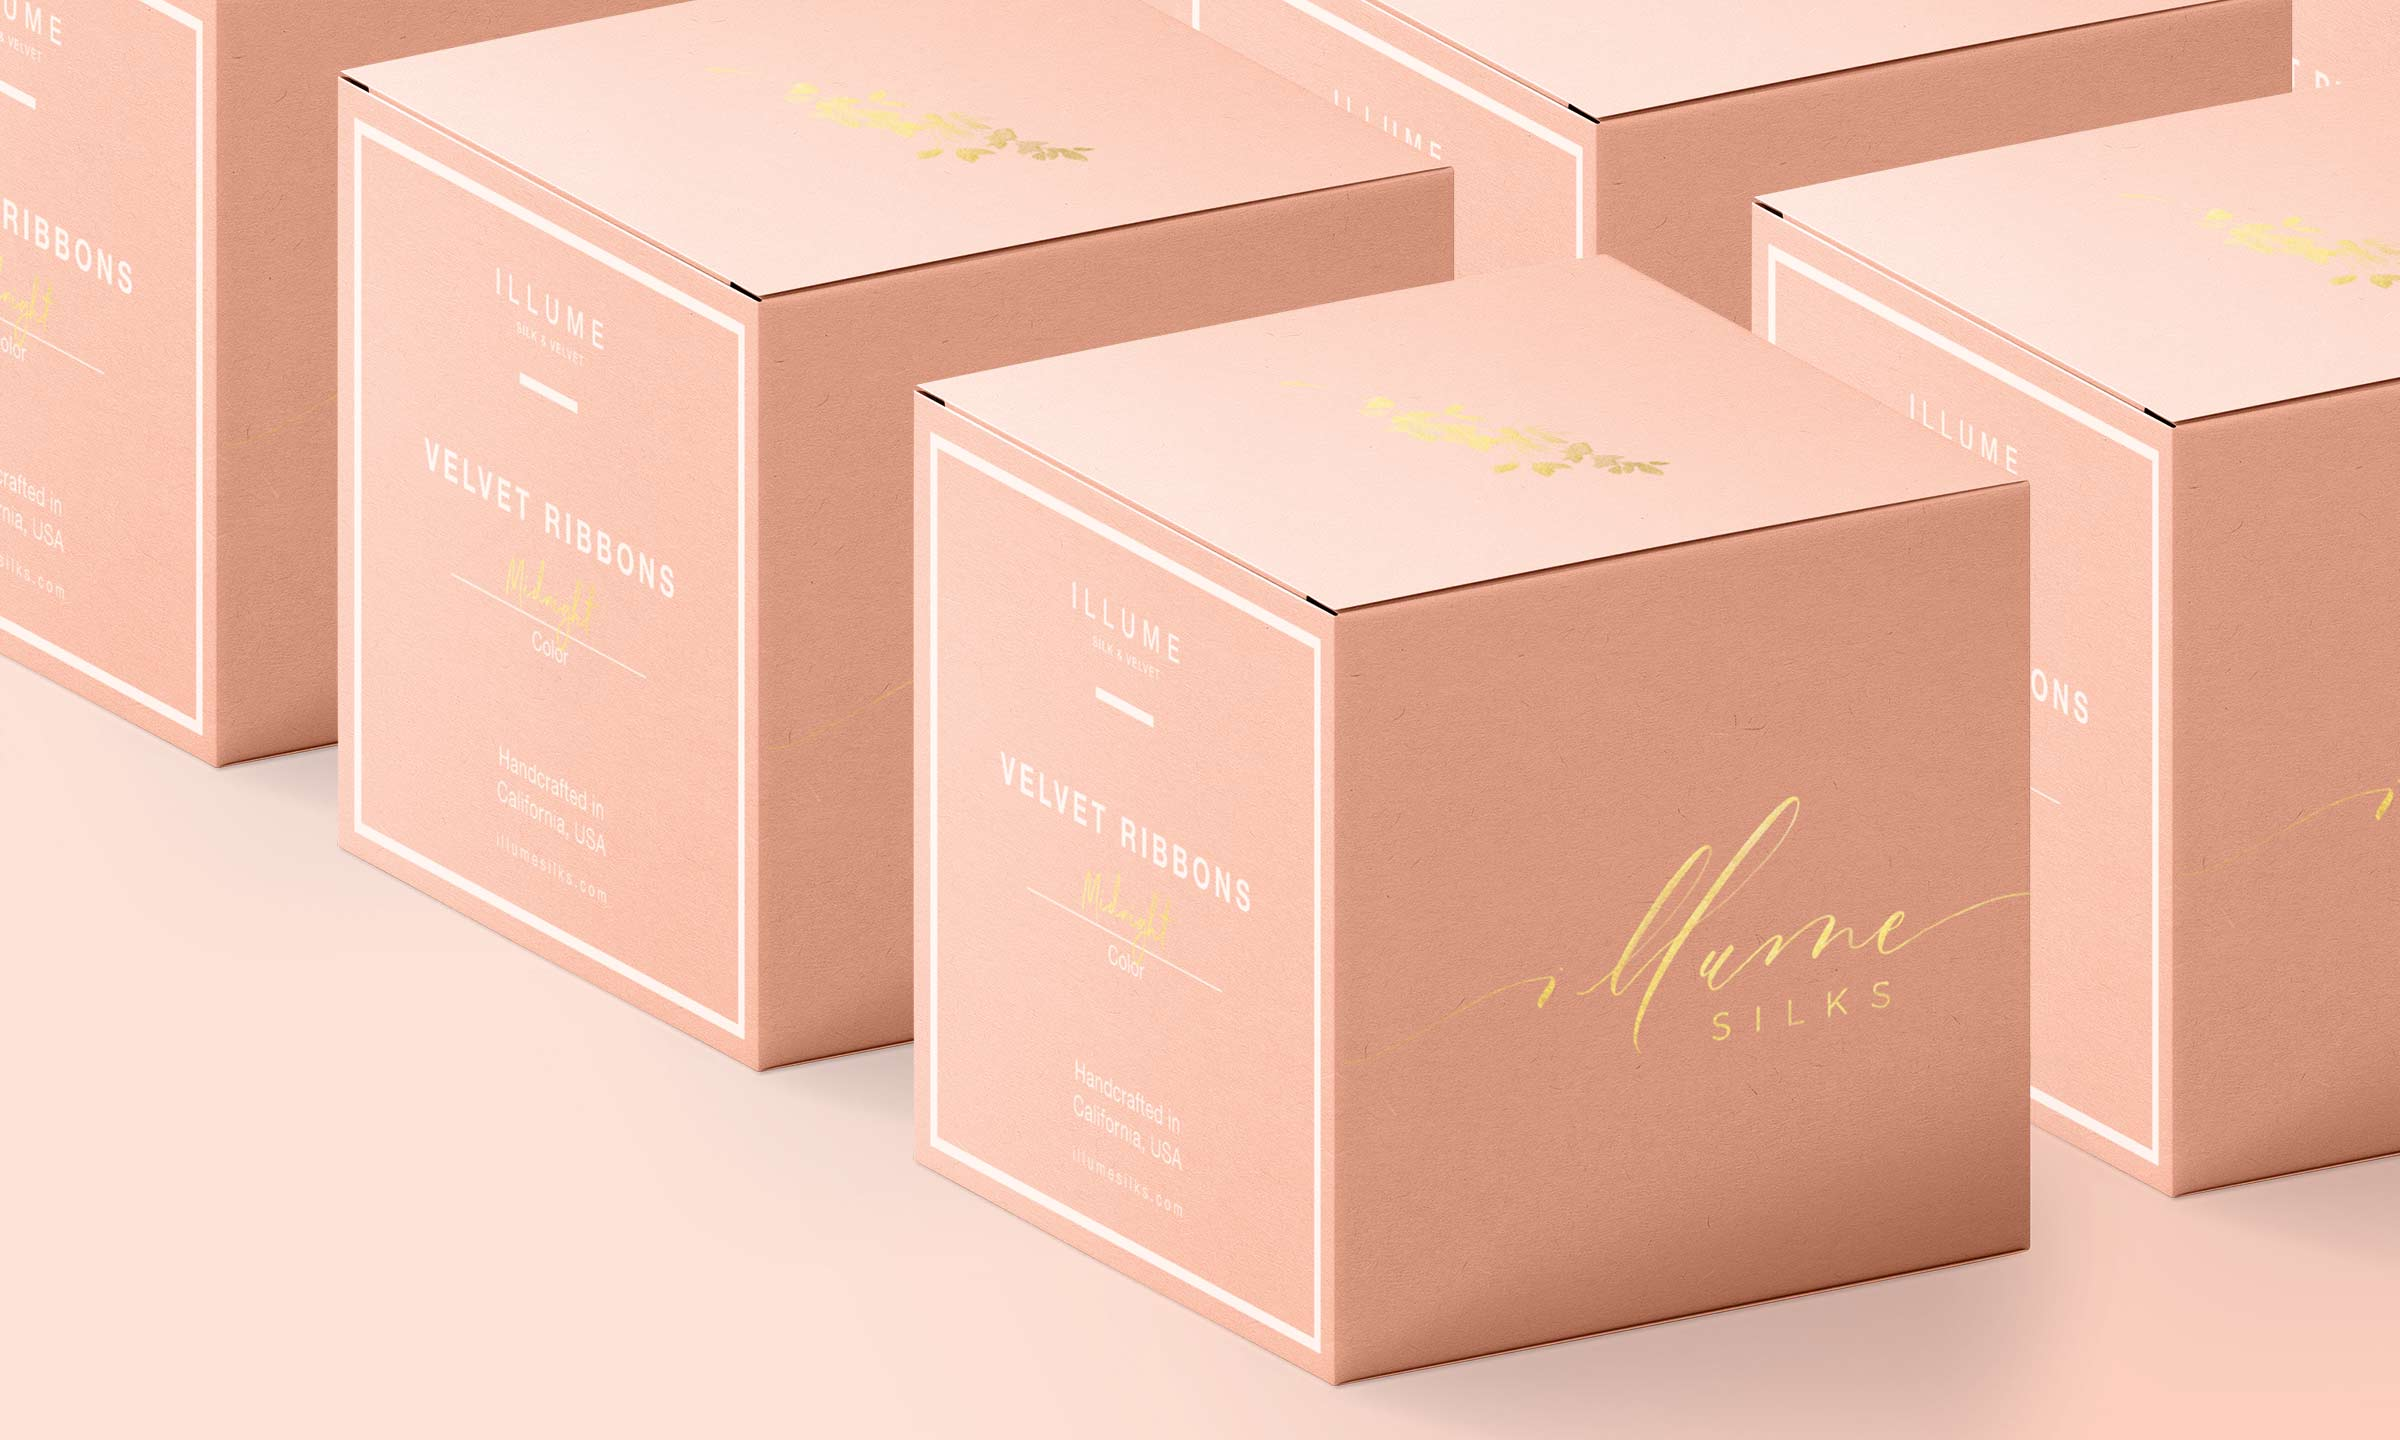 illume silks box packaging concept